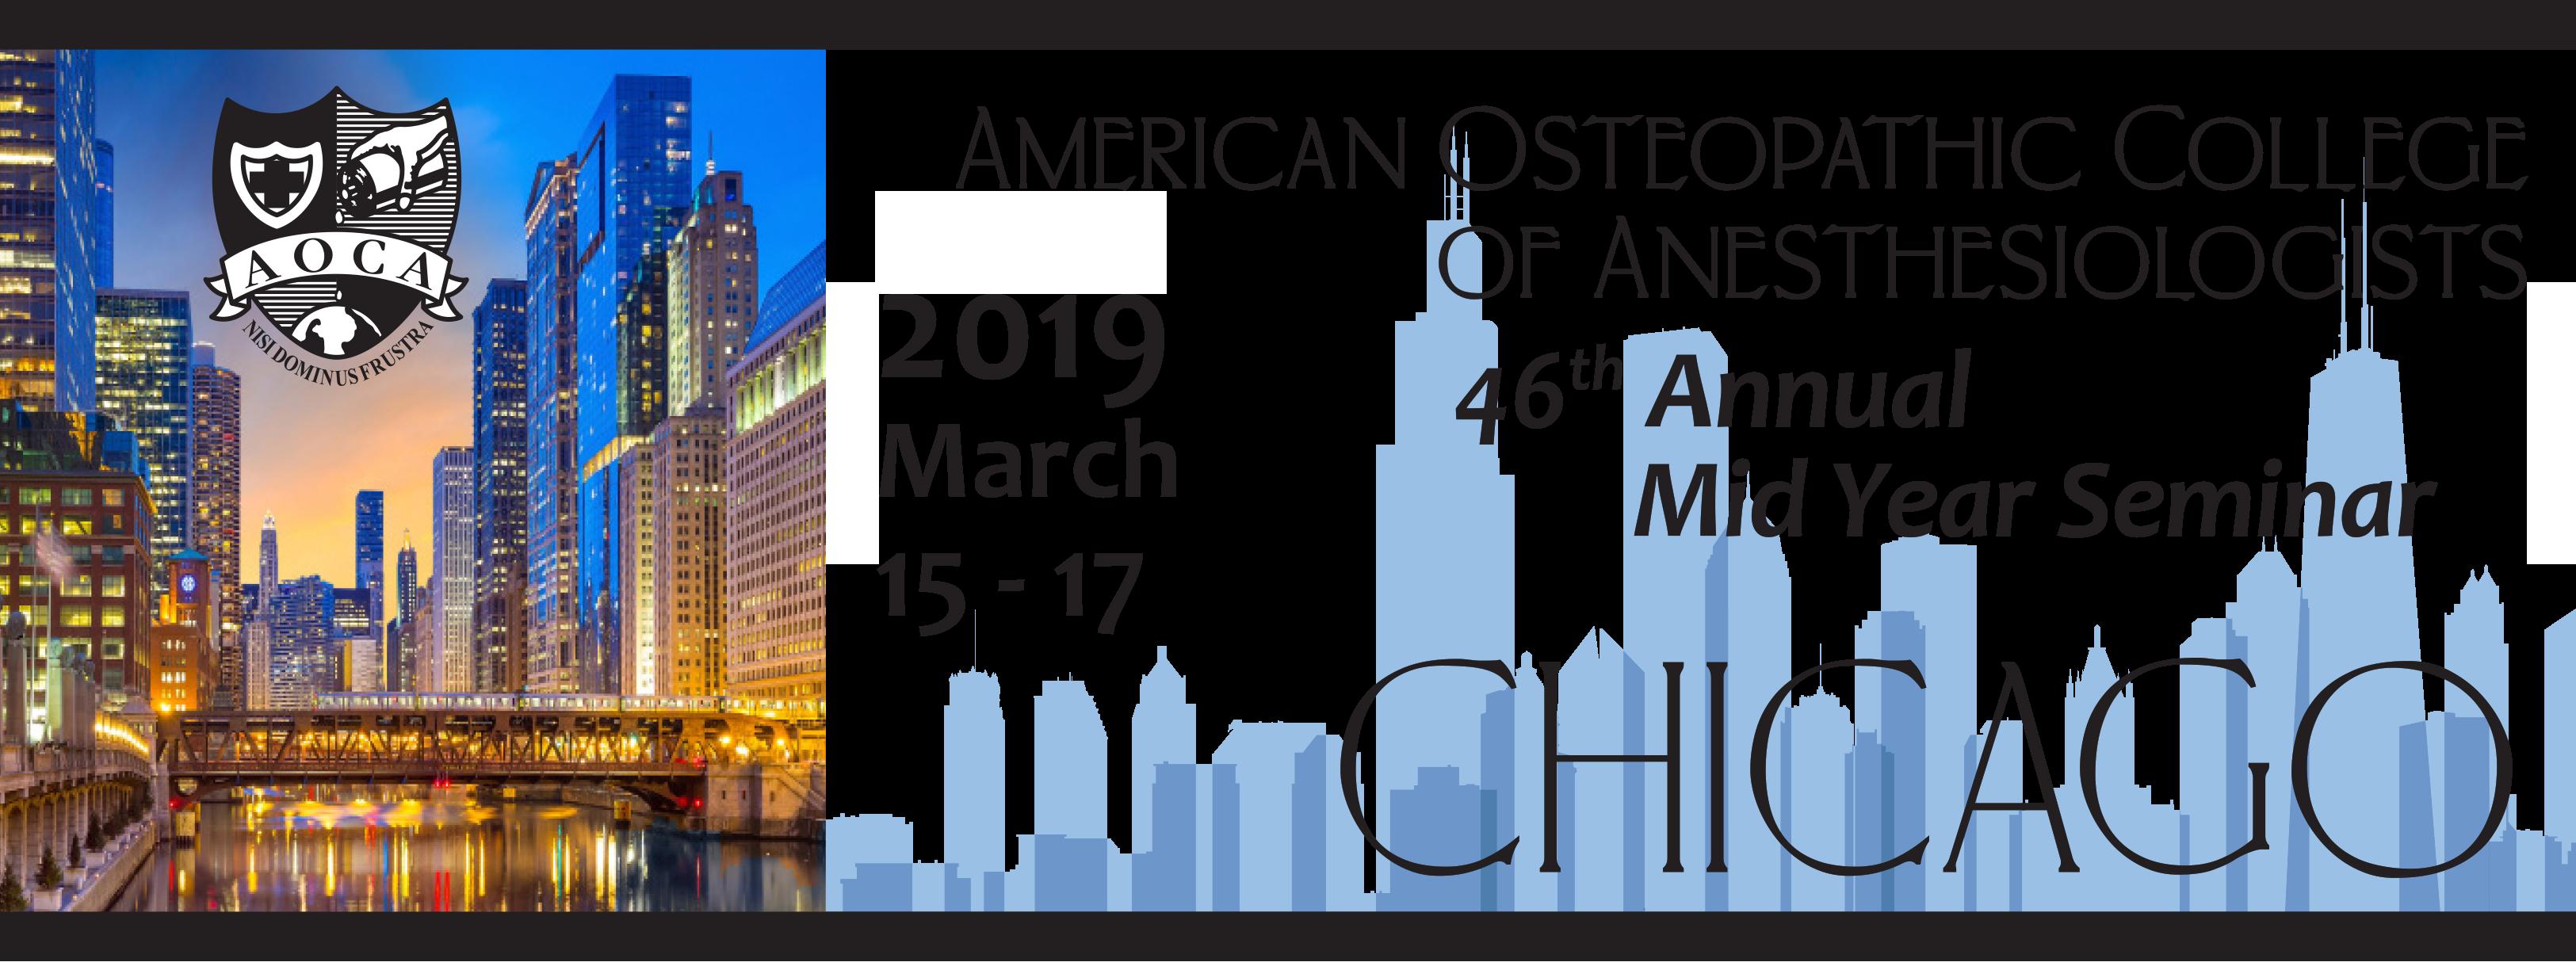 2019 AOCA Midyear Seminar